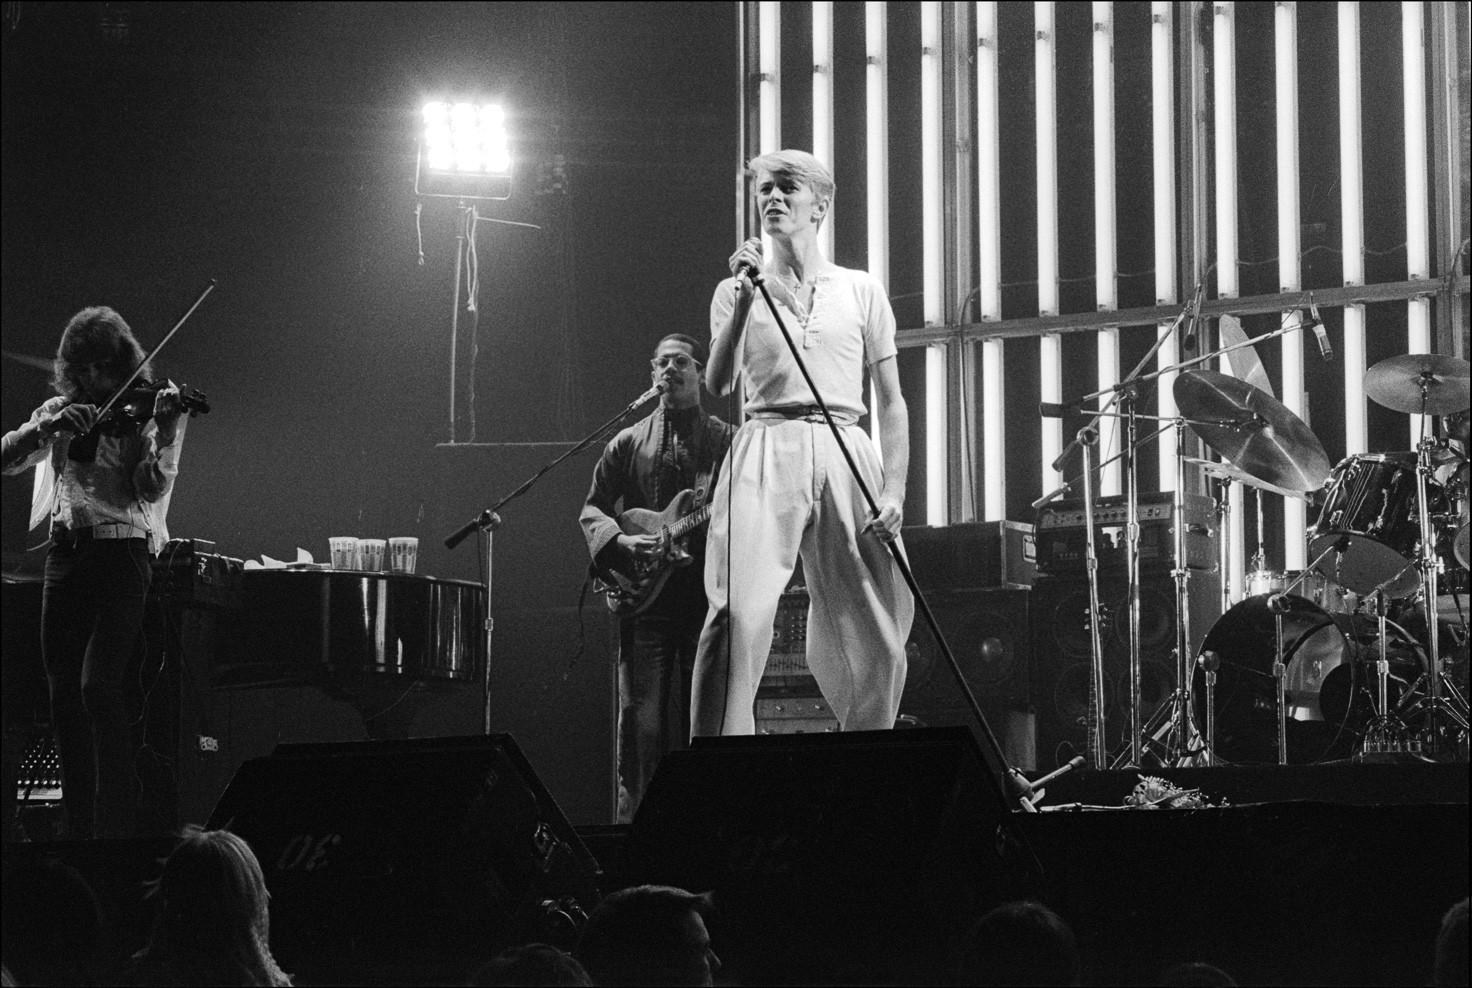 David_Bowie_Lights.jpg